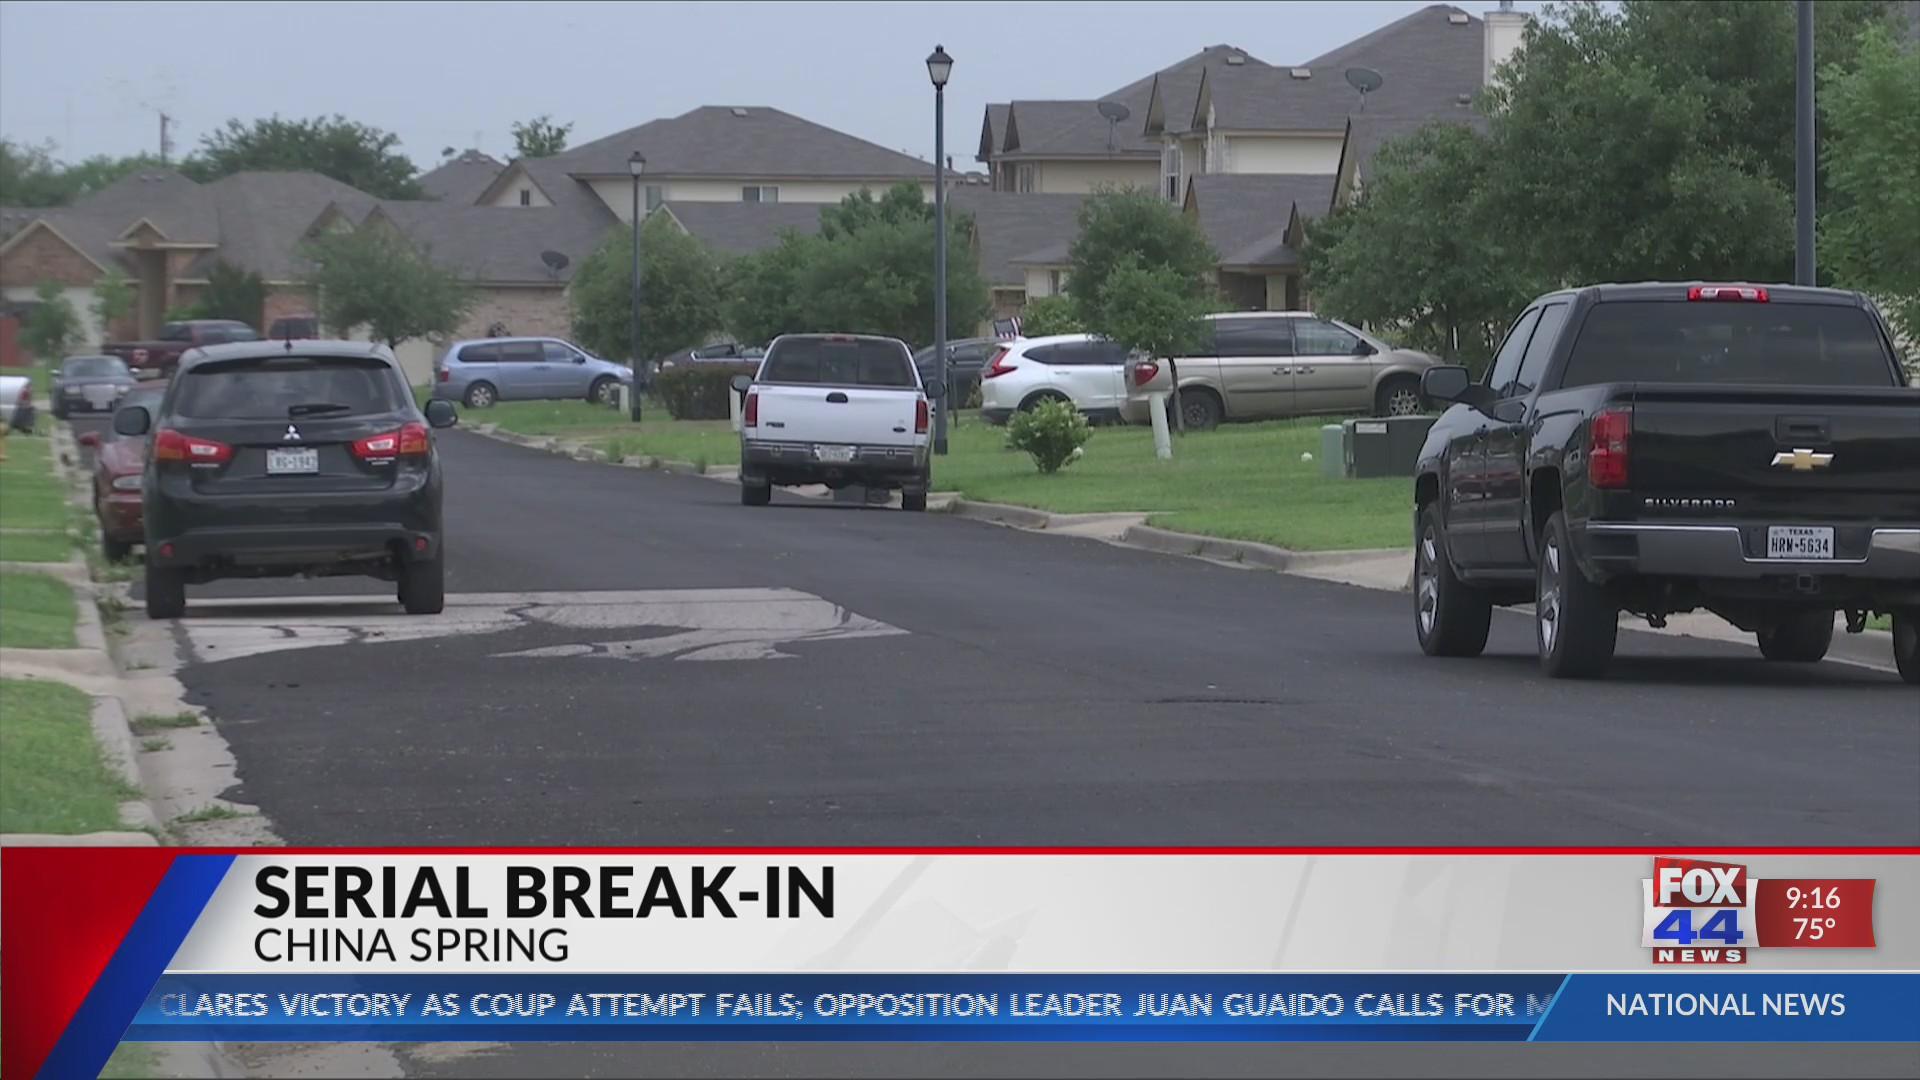 Vehicle break-ins put North Waco, China Spring residents on alert